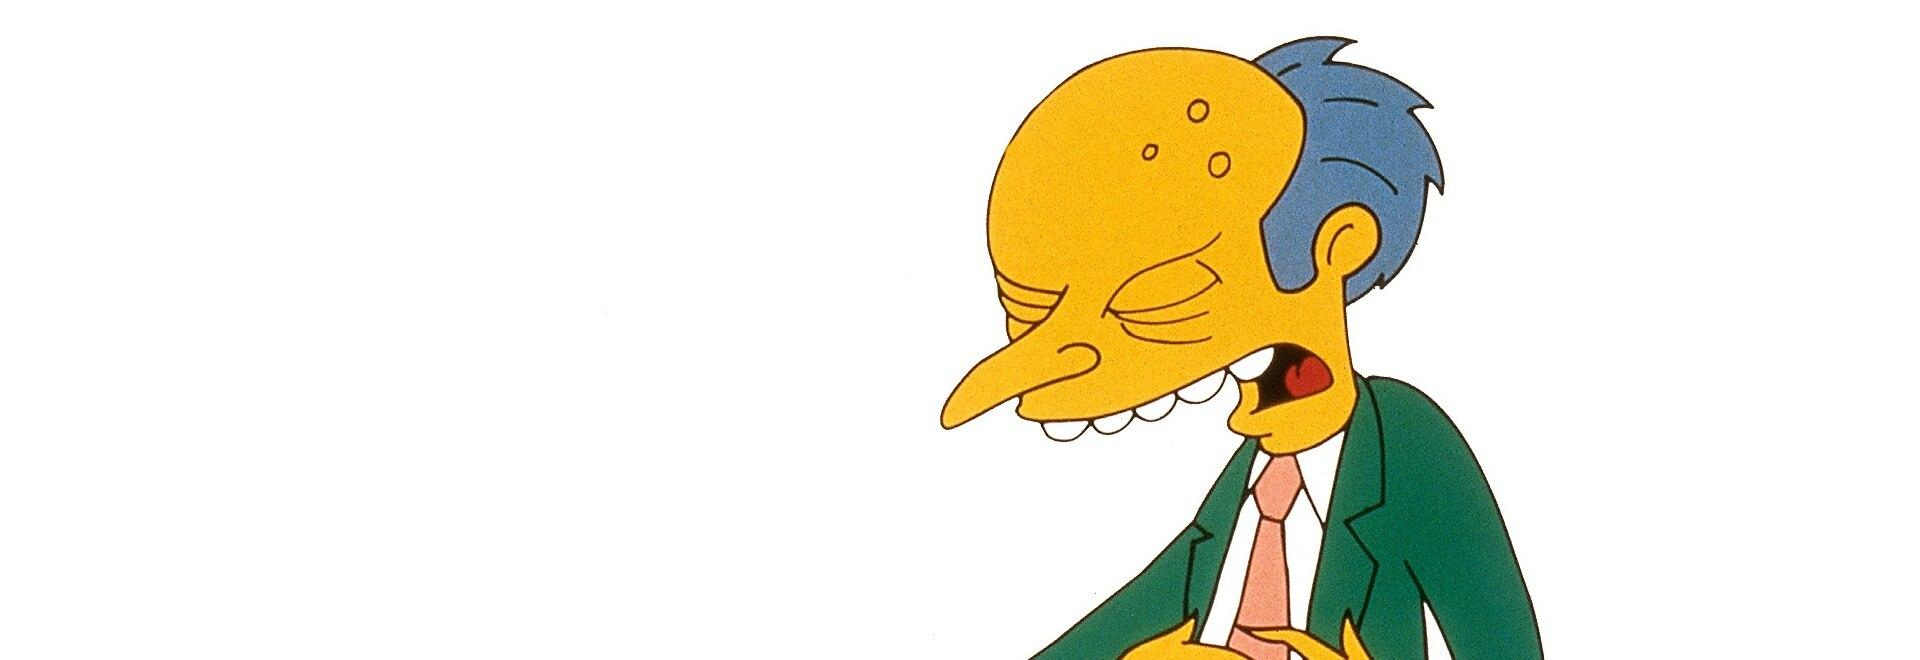 Homer toro scatenato